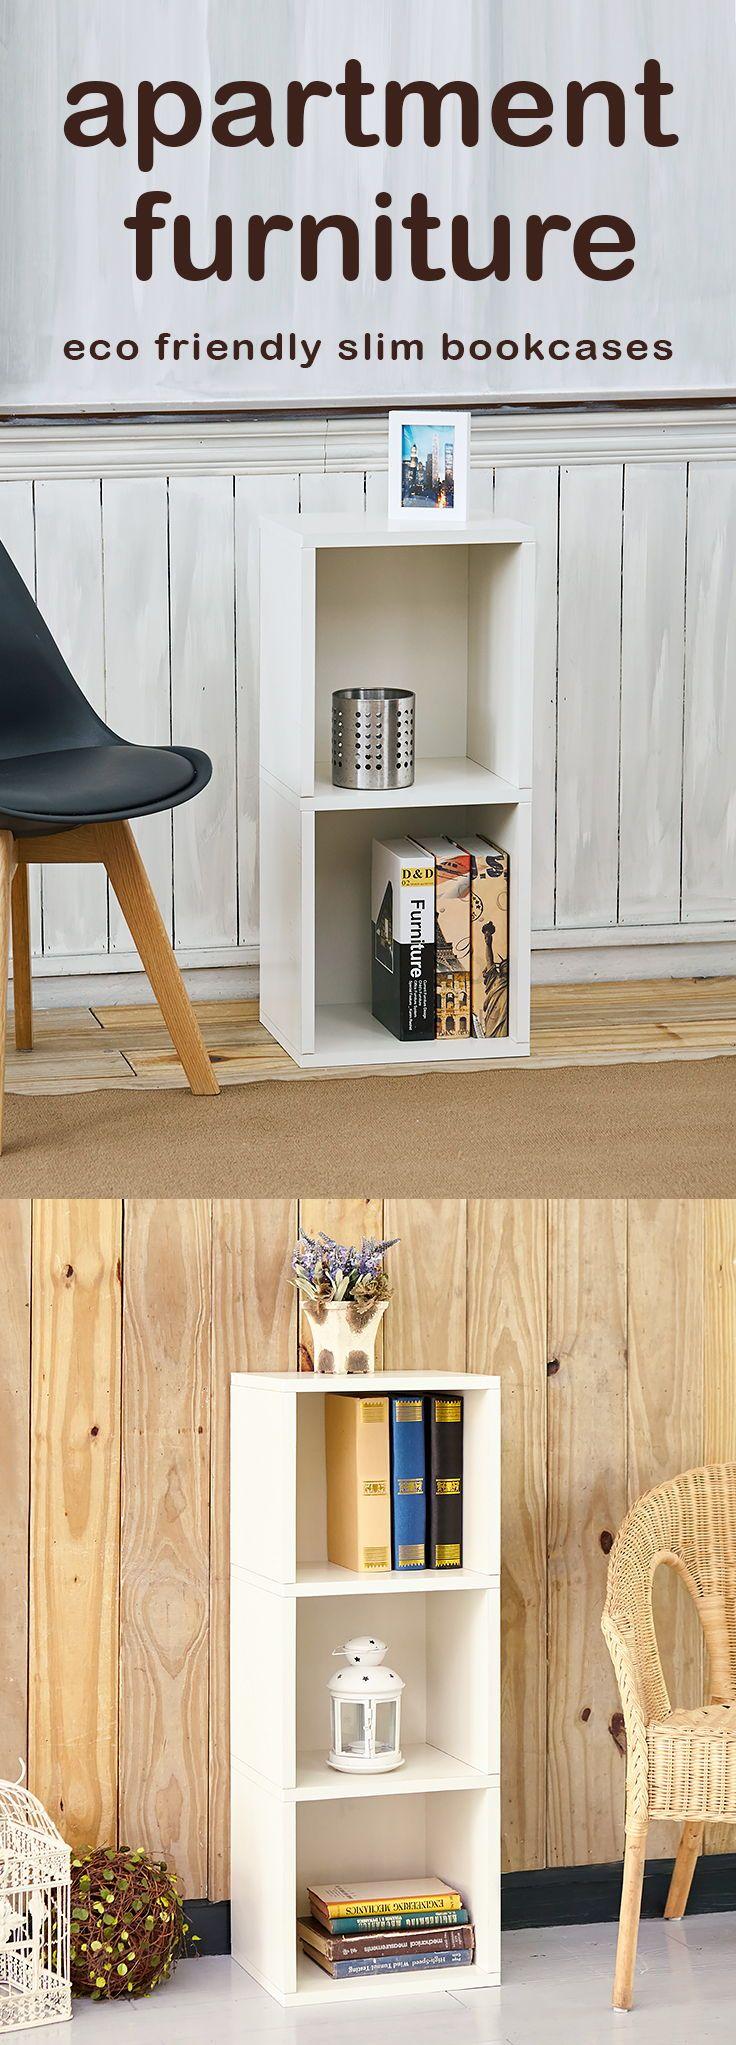 Stylish E Saving Apartment Furniture Cubbies Cubes Rectangle Shoe Closet Shelfie Bookcases Ecofriendly Slim Narrow